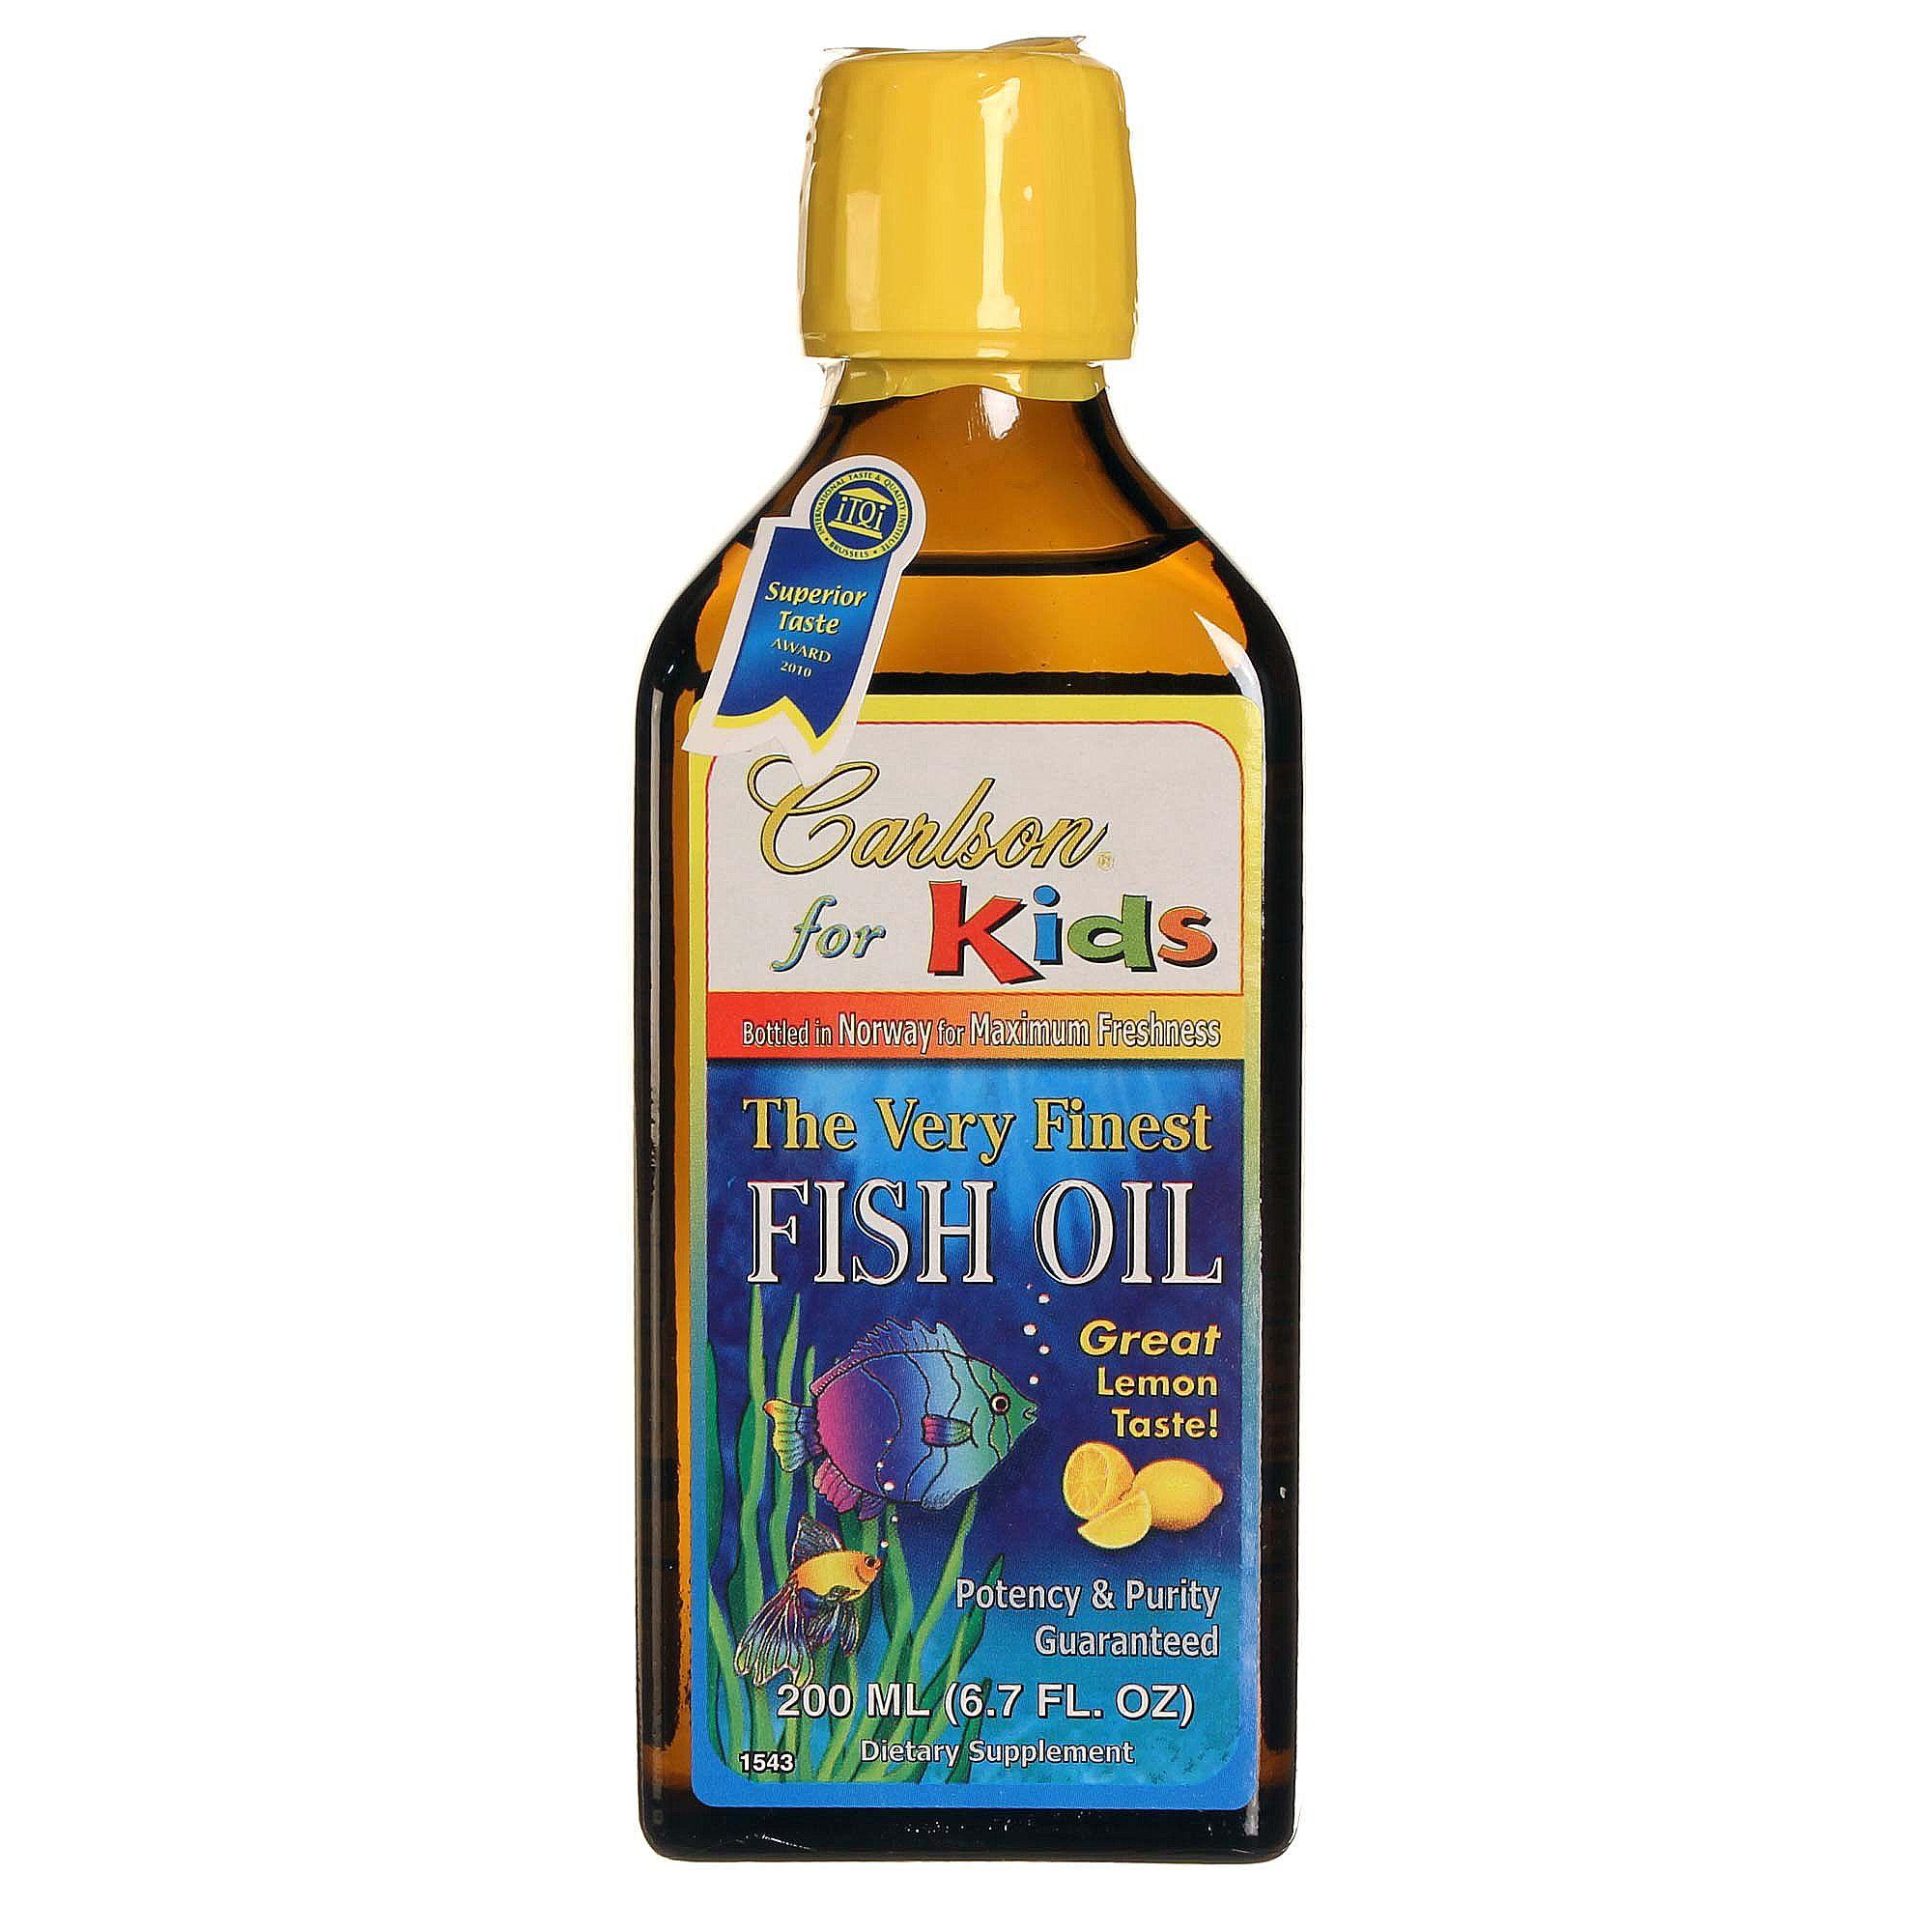 Carlson labs very finest fish oil for kids lemon 200 ml for Kids fish oil